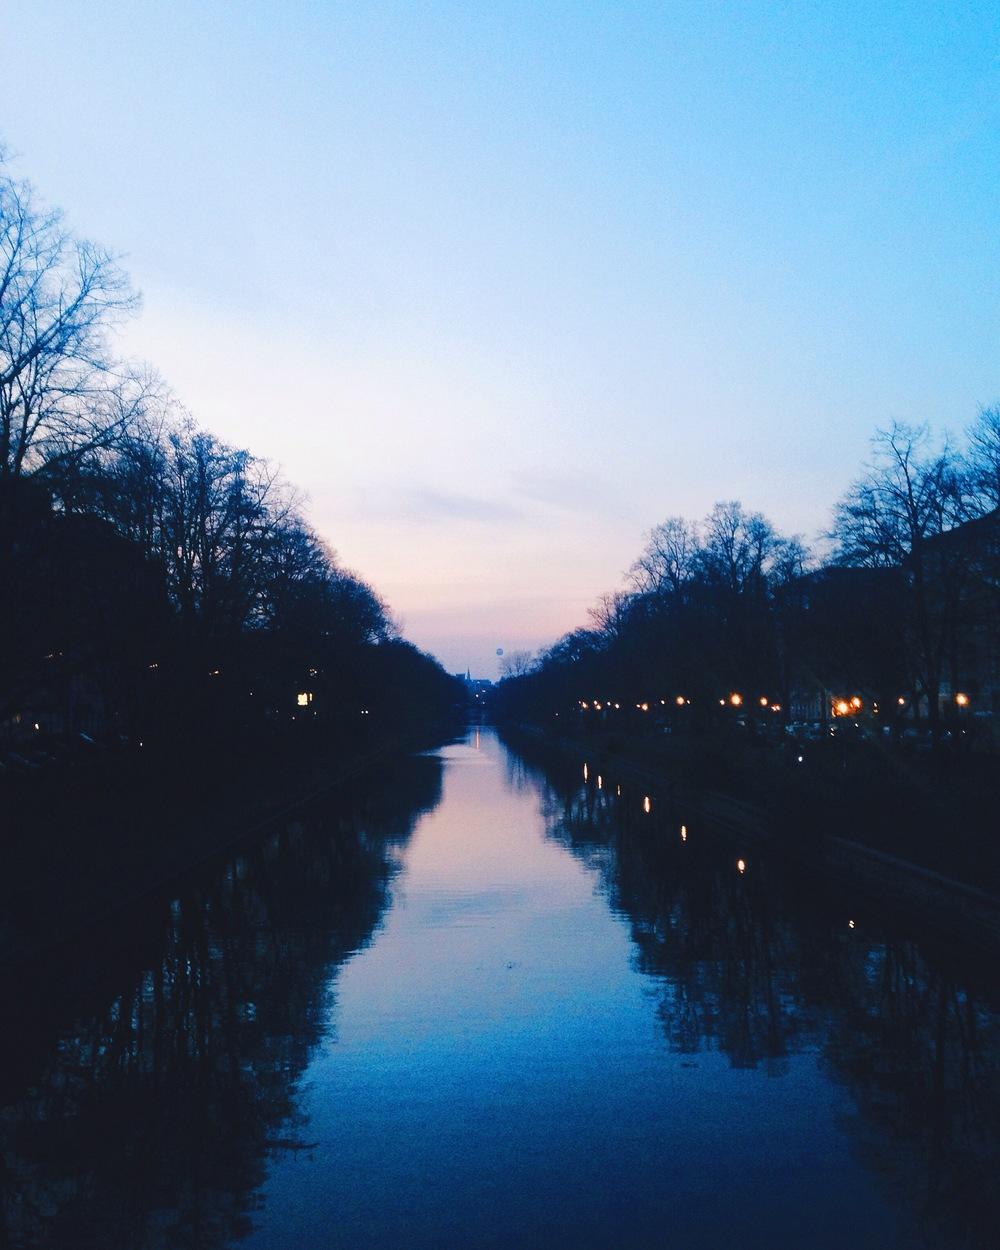 The canals of Kreuzberg